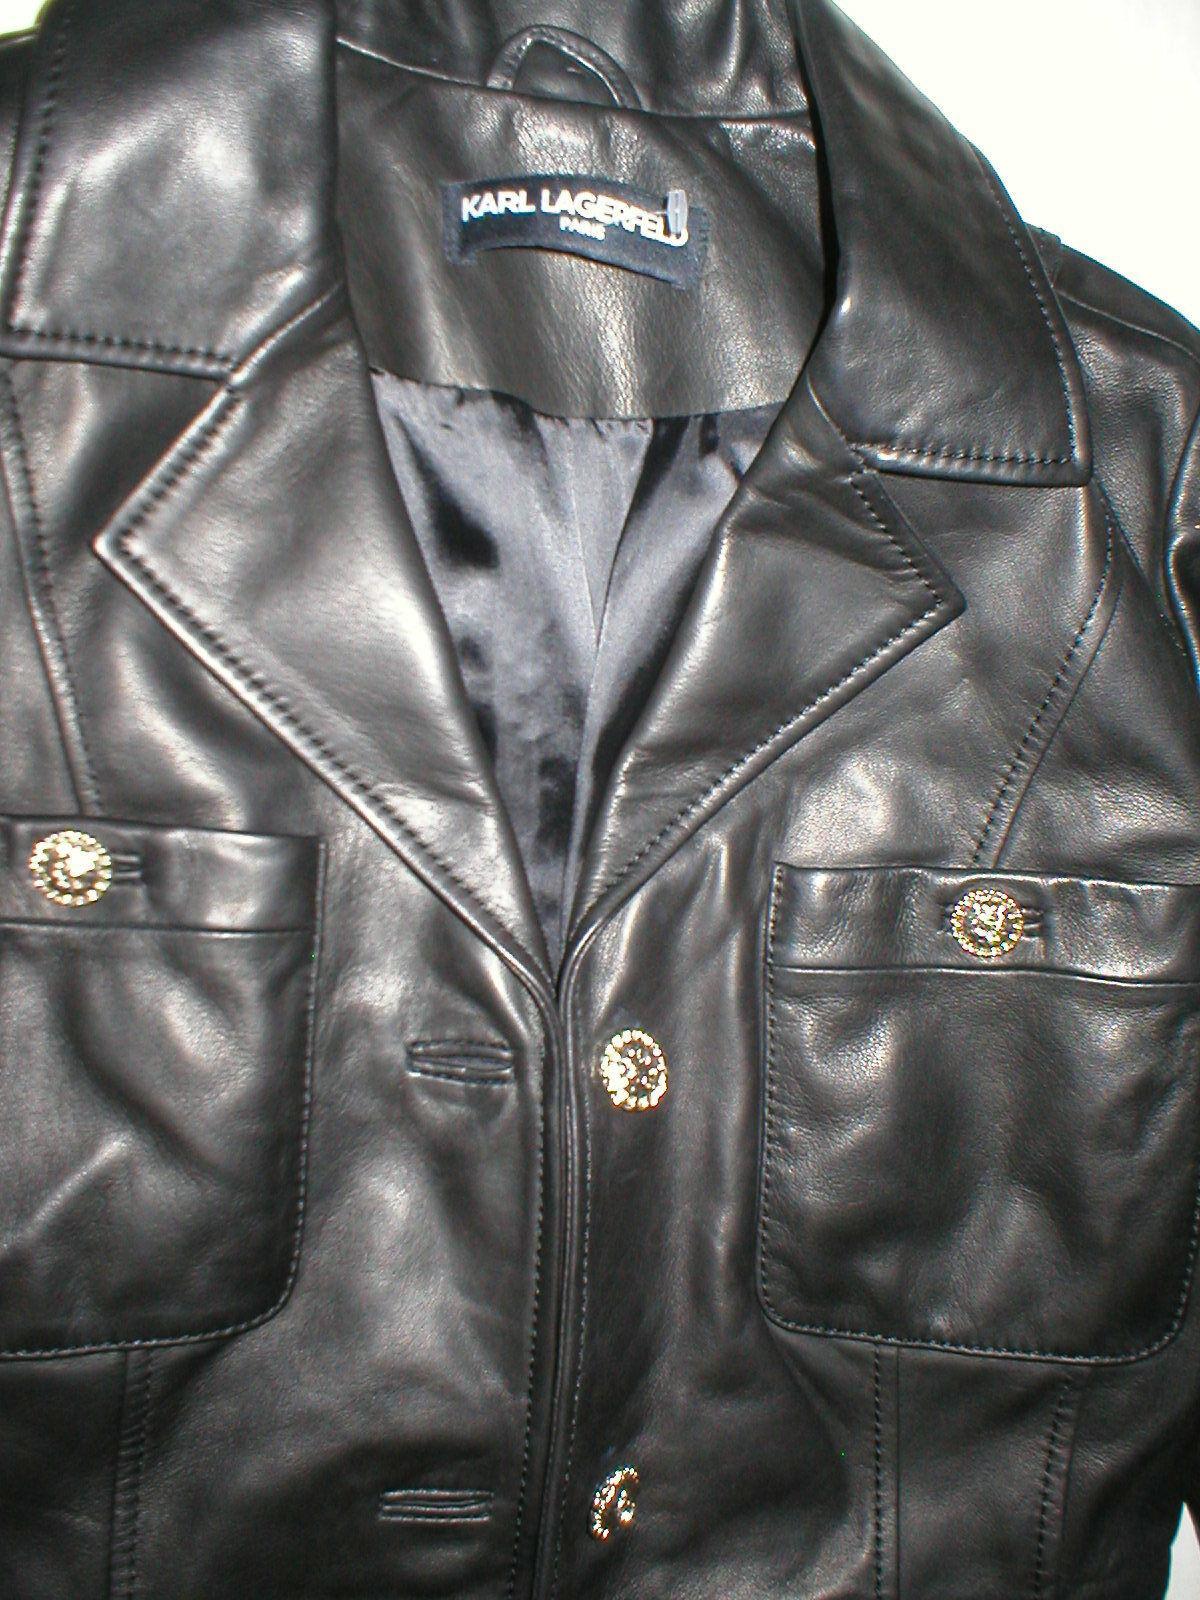 New Womens S Soft Karl Lagerfeld Paris Leather Jacket Black Silver Designer Lamb image 8